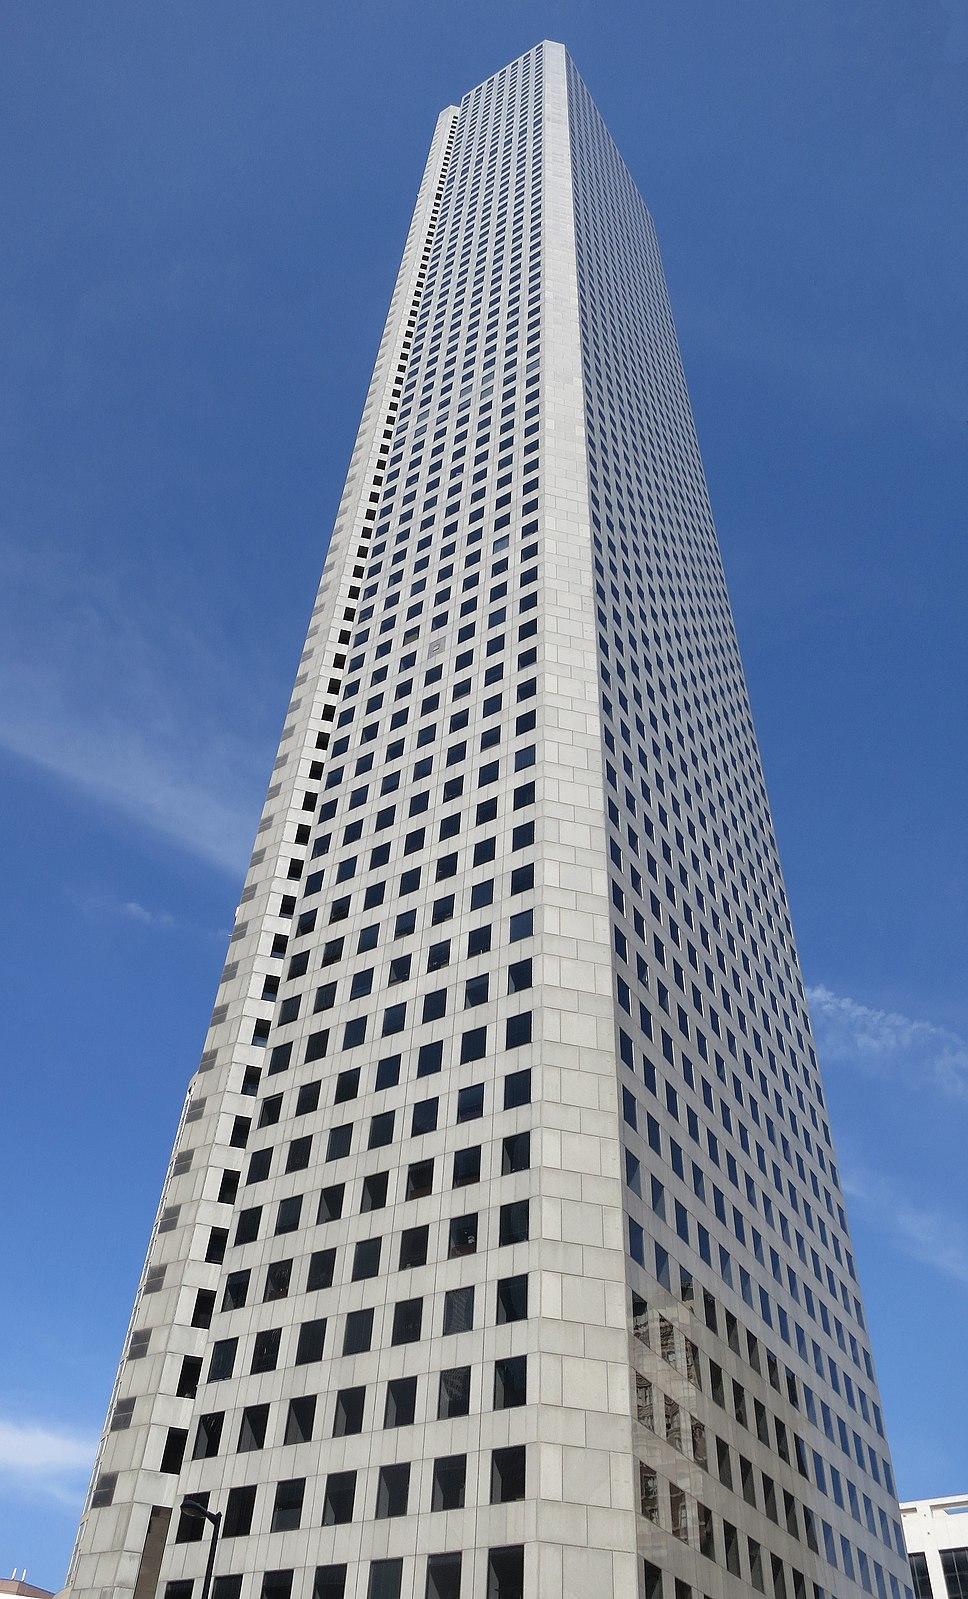 JPMorgan Chase Tower, Houston, Texas